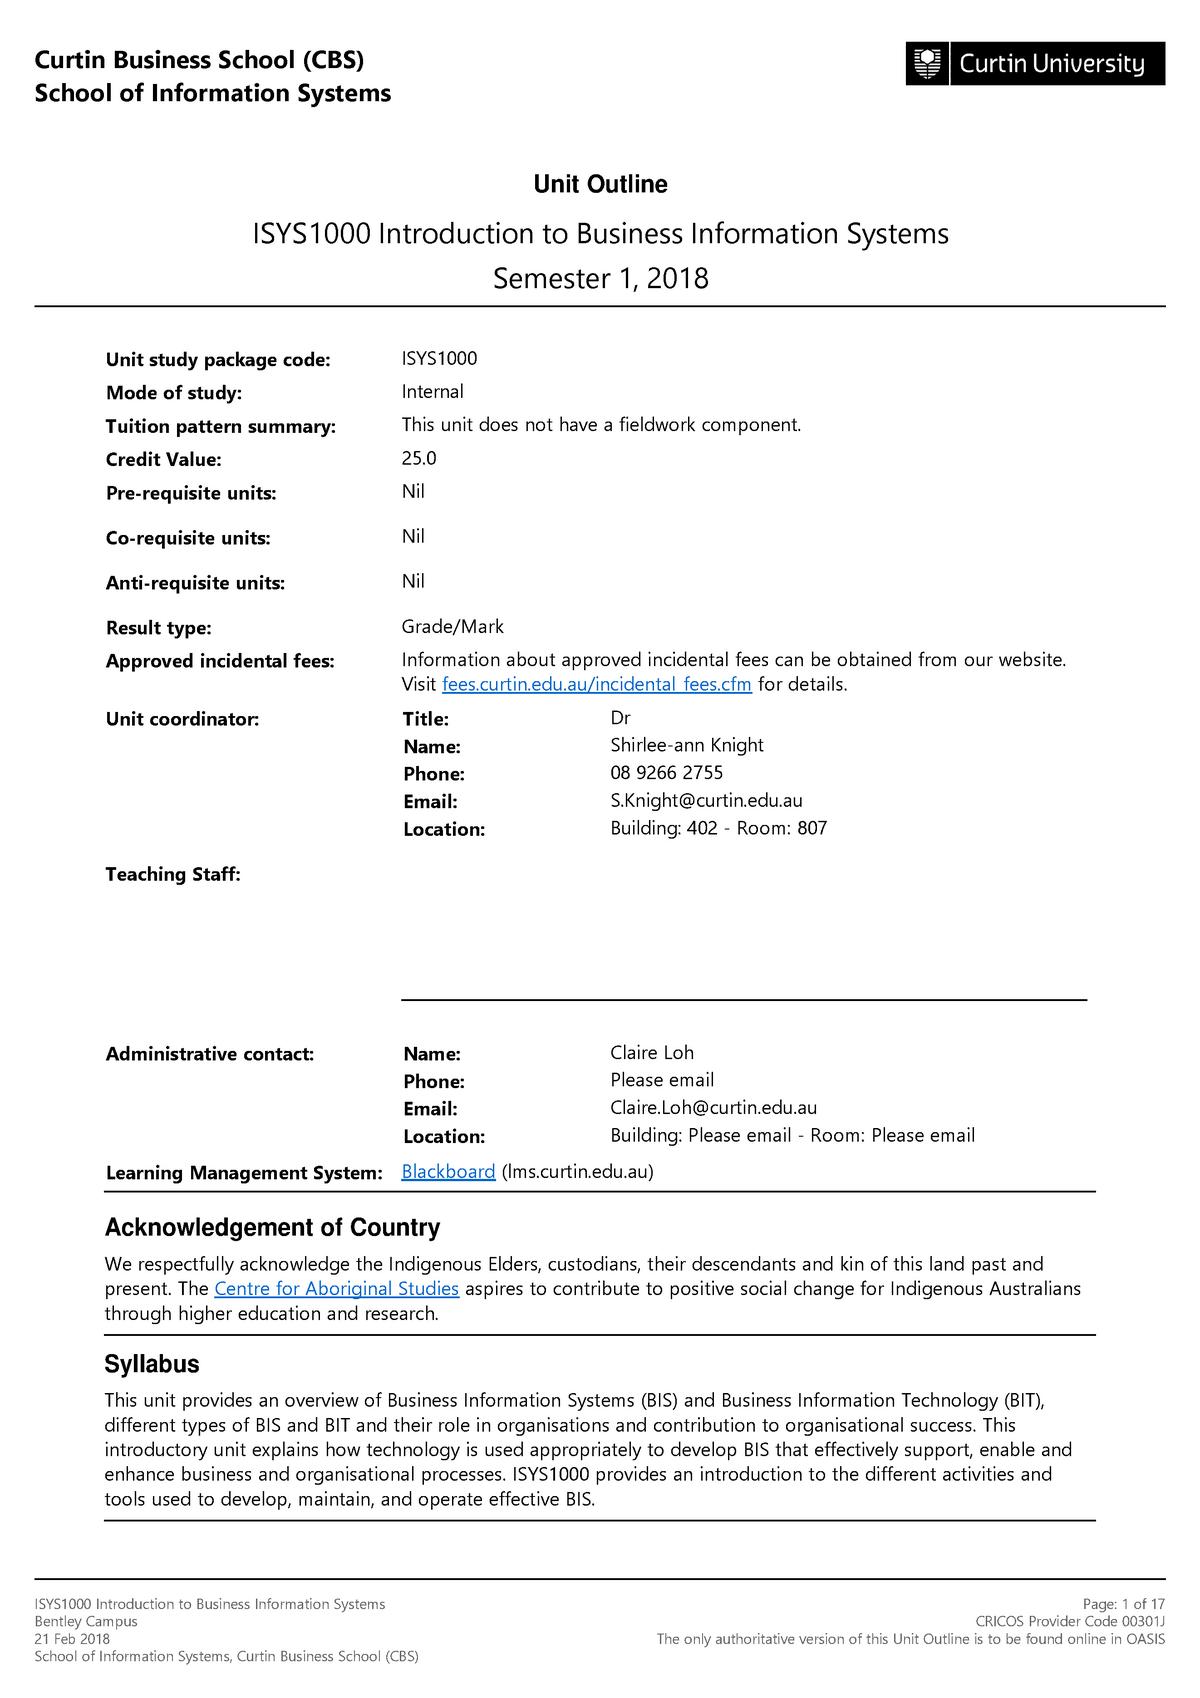 Unit Outline - Business Information Systems 100 10830 - StuDocu